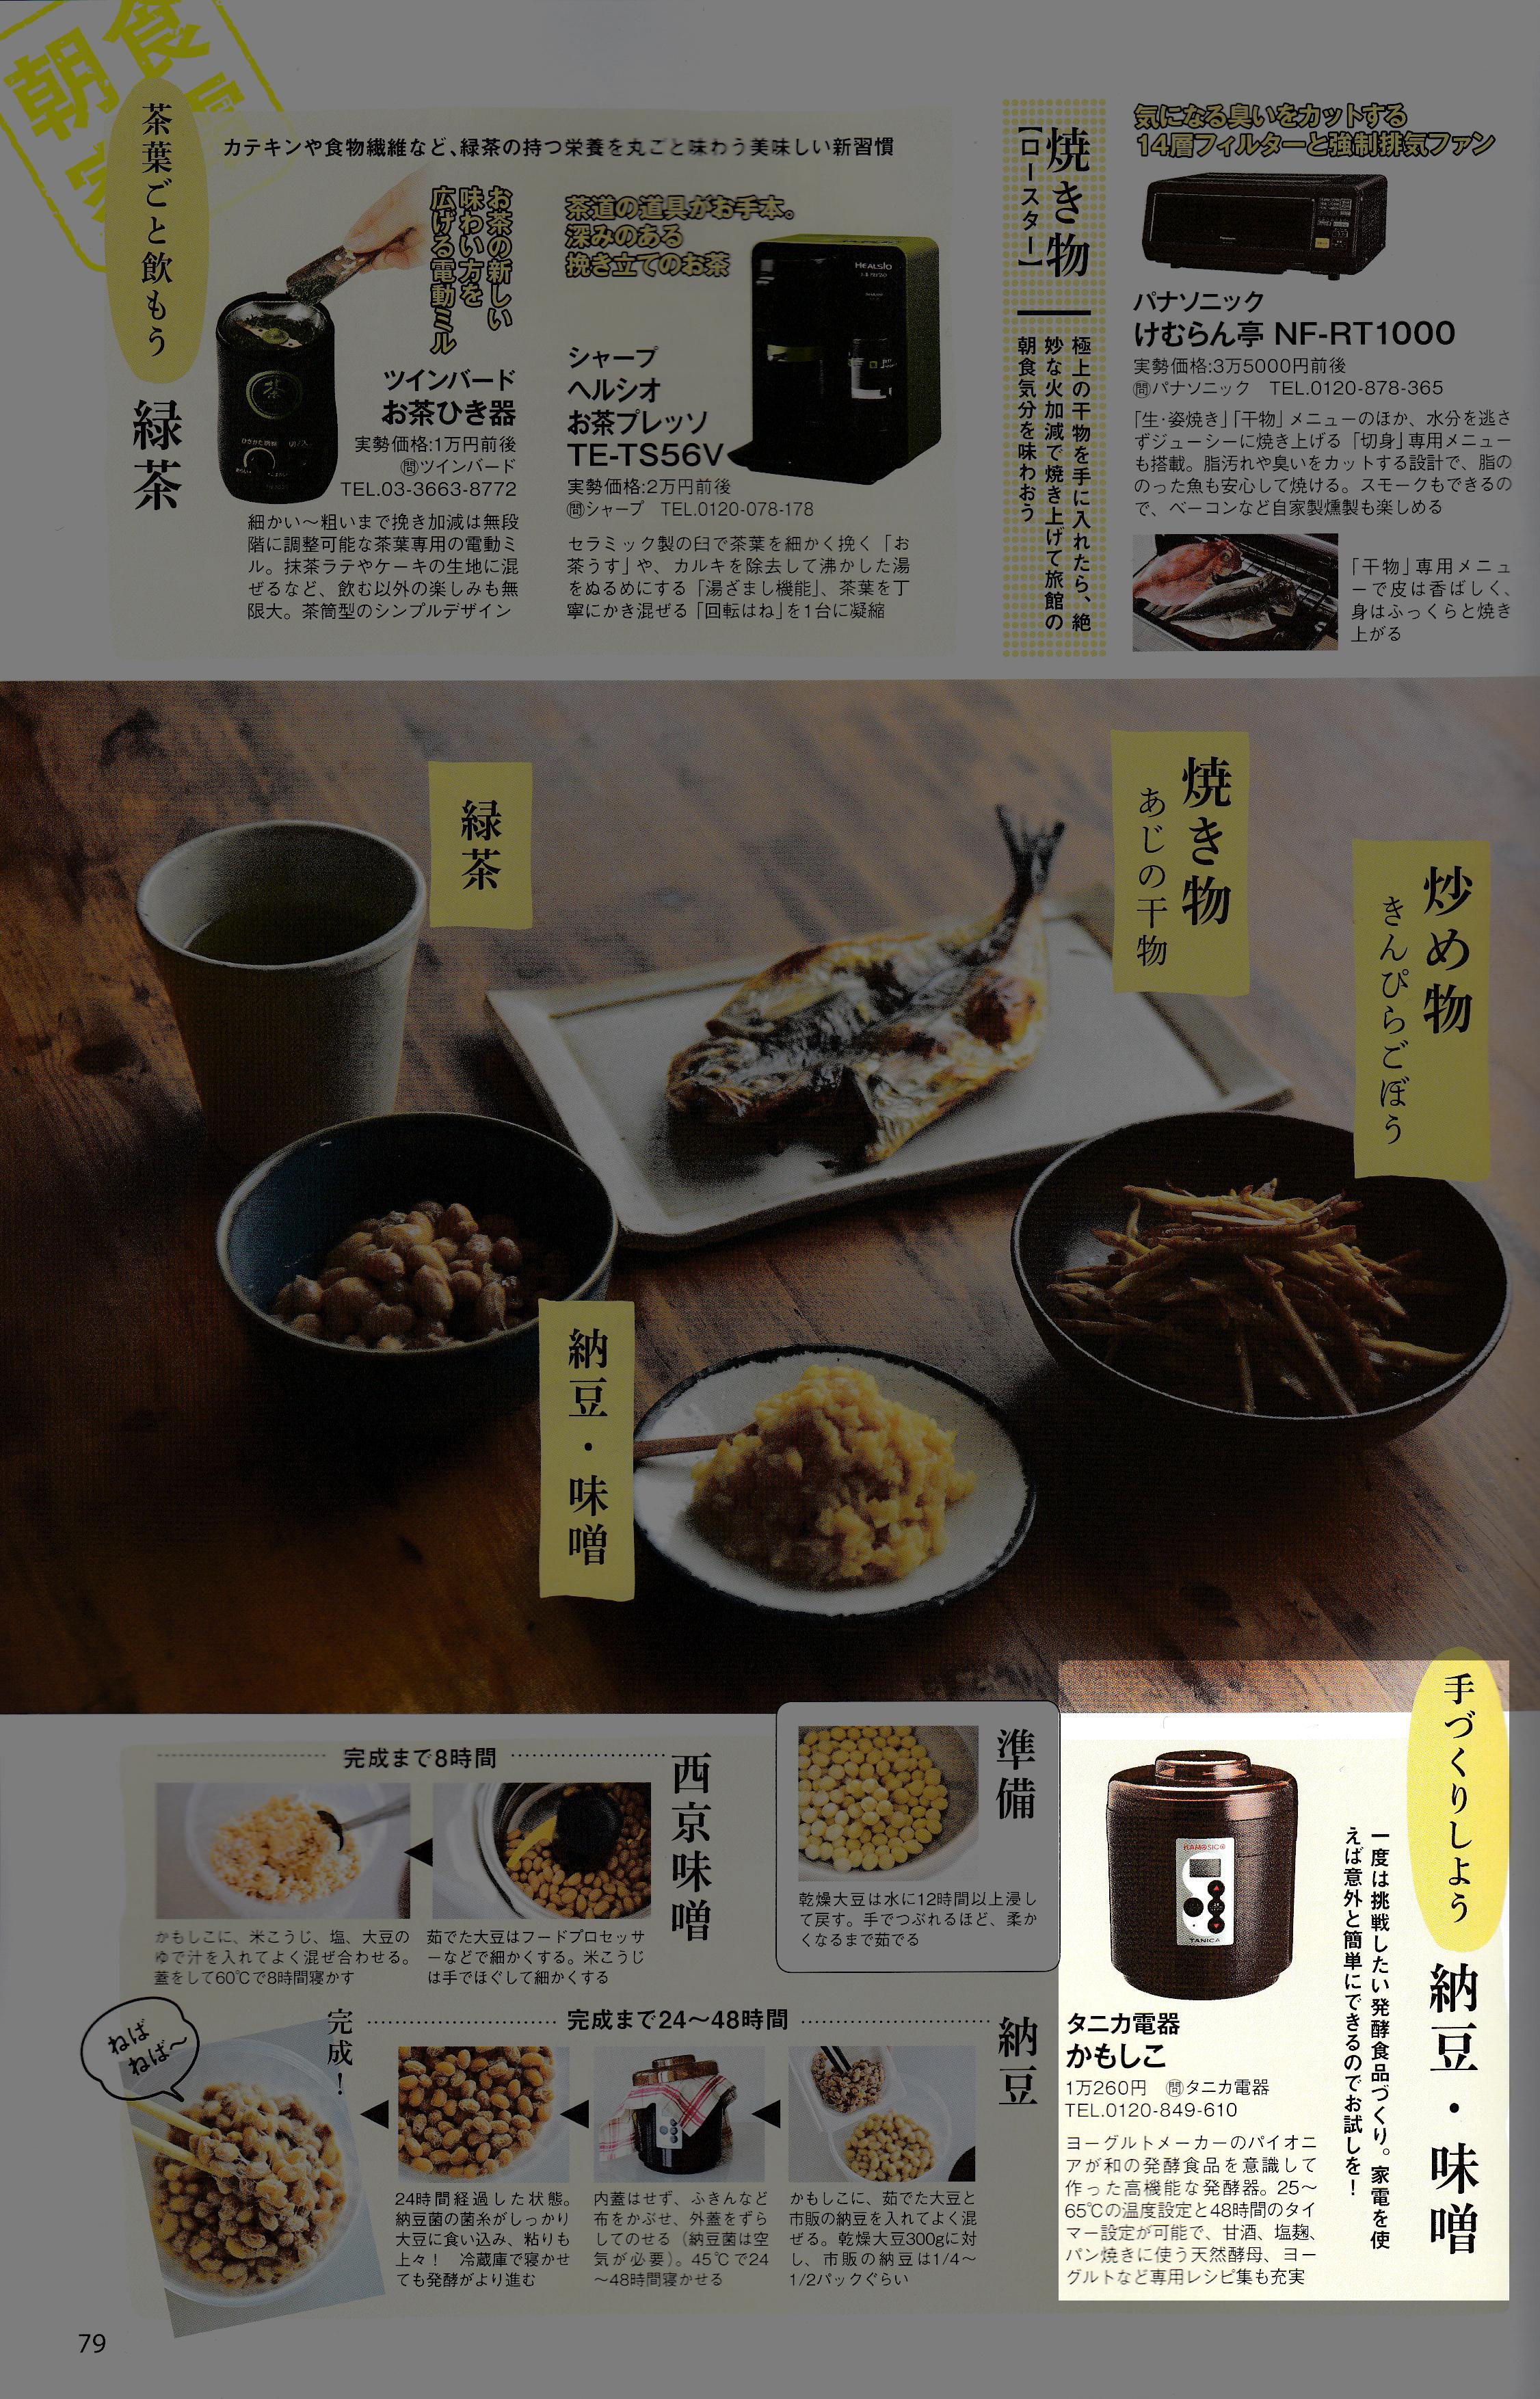 「GoodsPress」2017年5月号に掲載にKAMOSICO